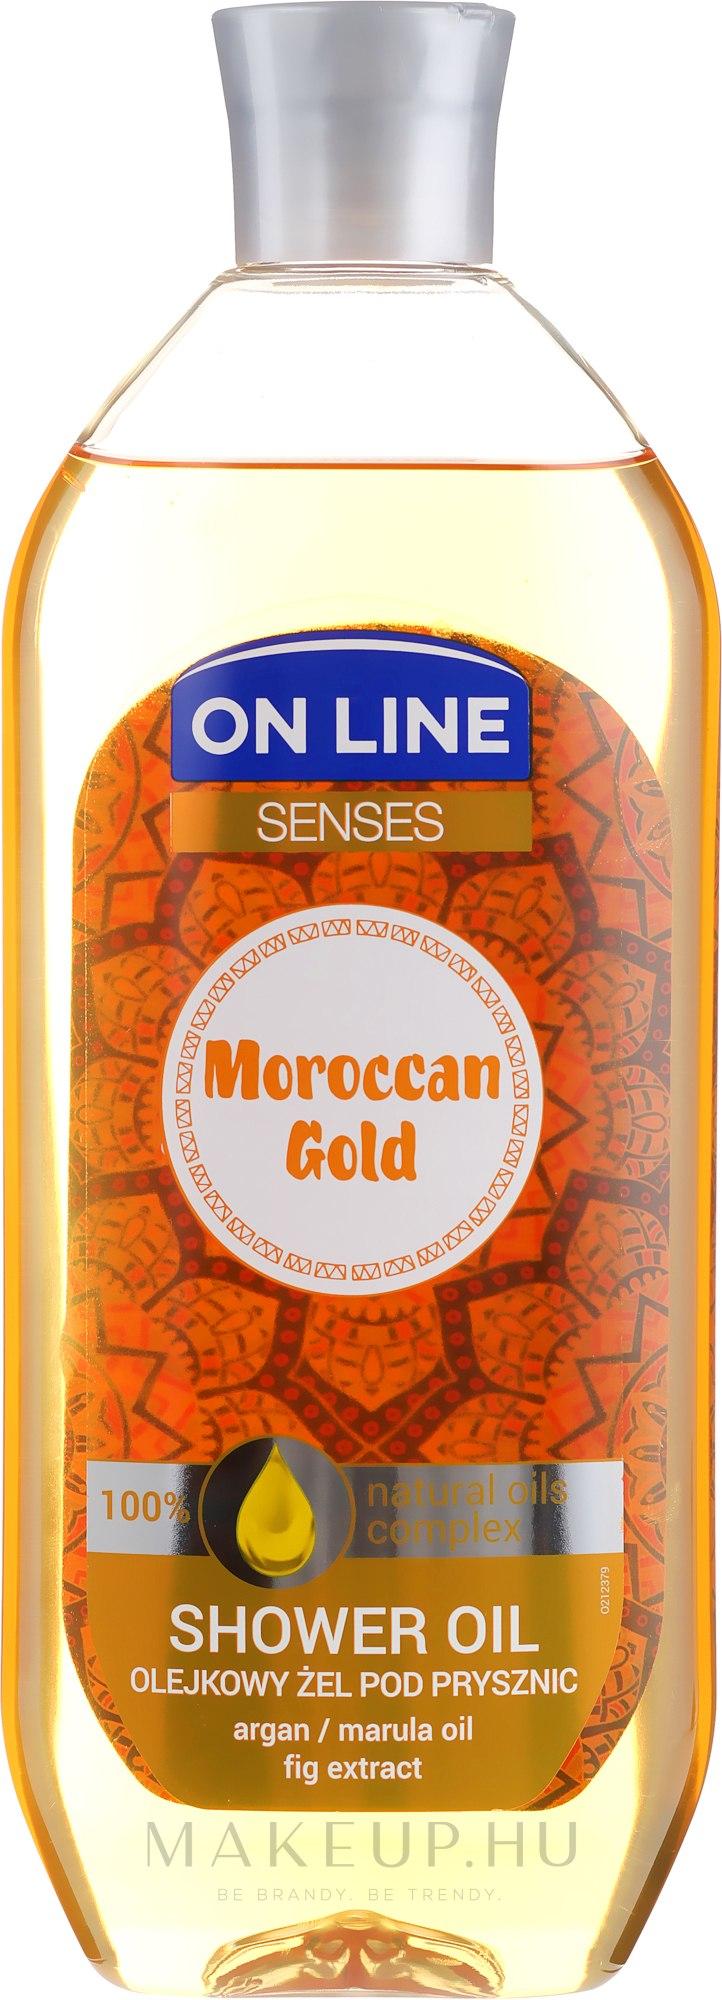 Tusfürdő olaj - On Line Senses Shower Oil Moroccan Gold — fotó 500 ml